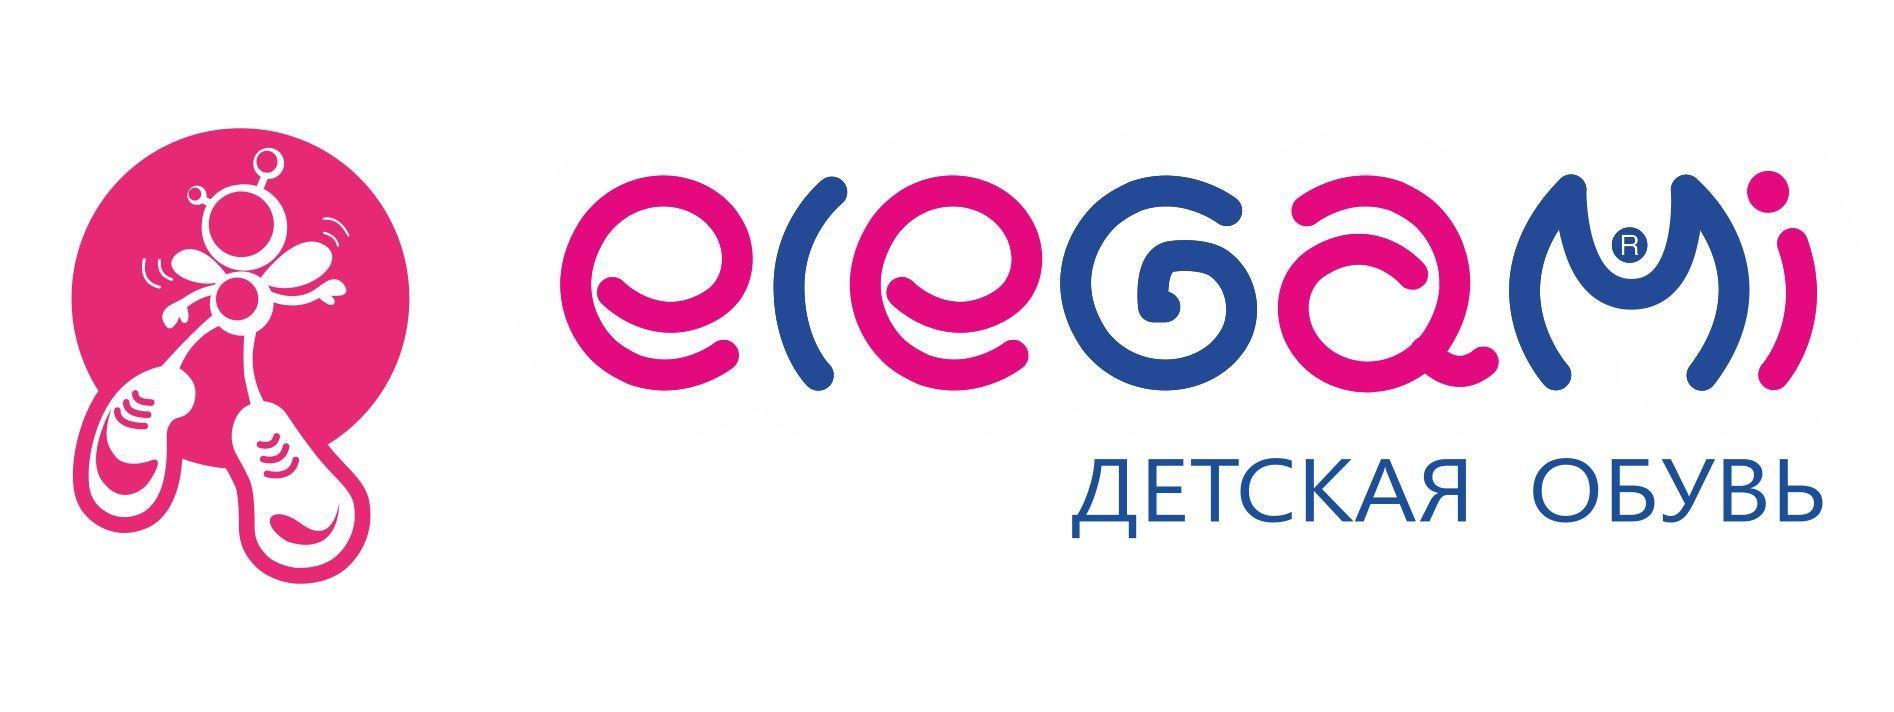 Элегами